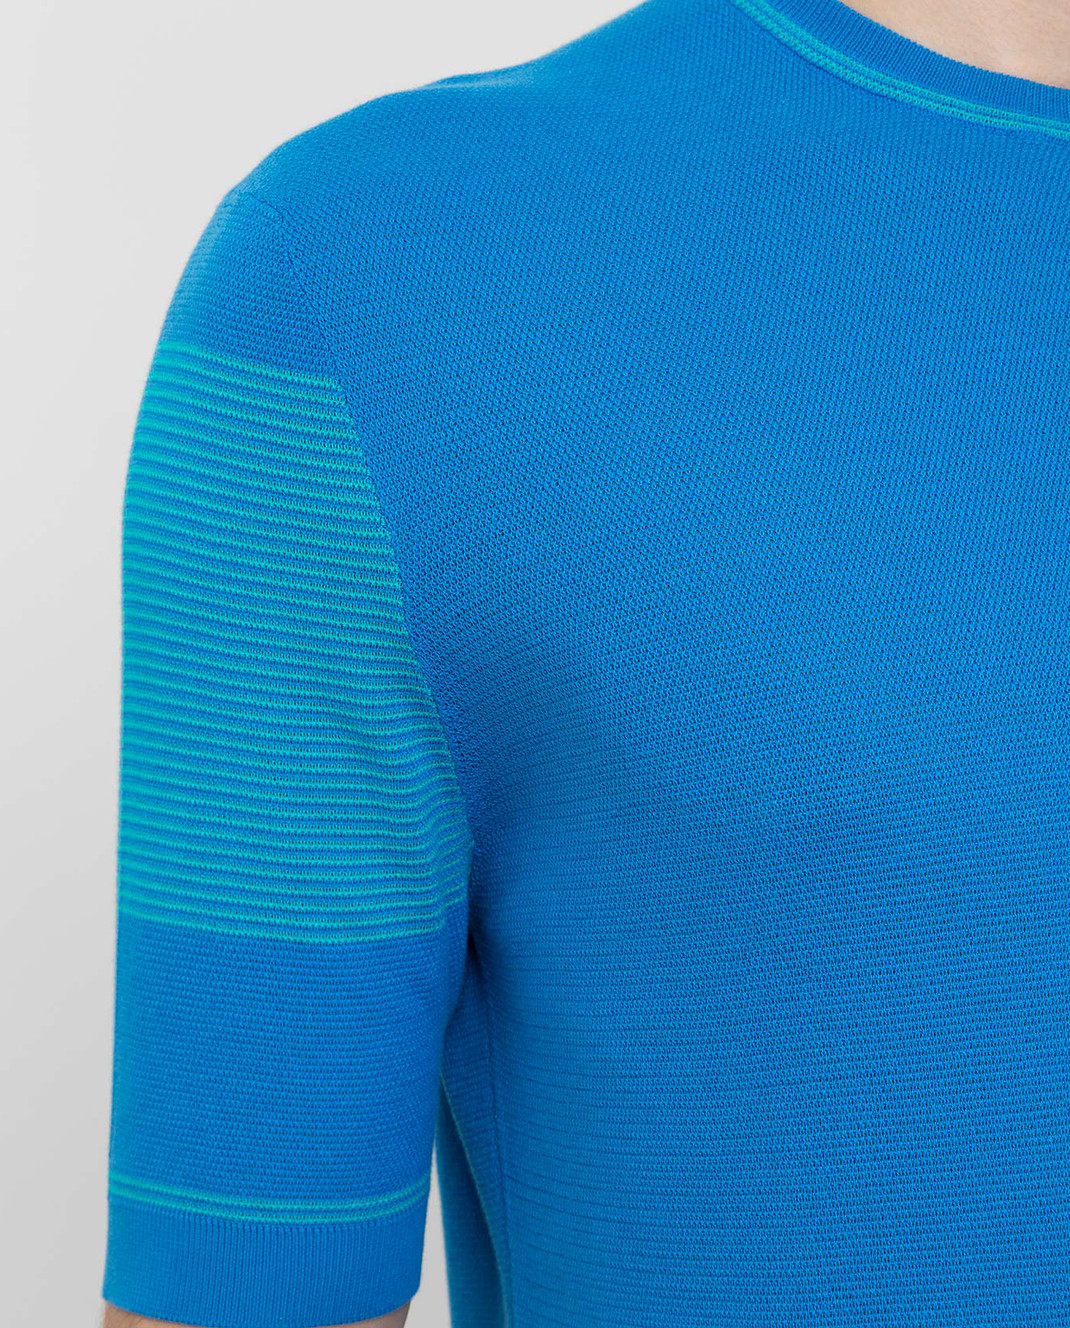 Castello d'Oro Синяя футболка изображение 5